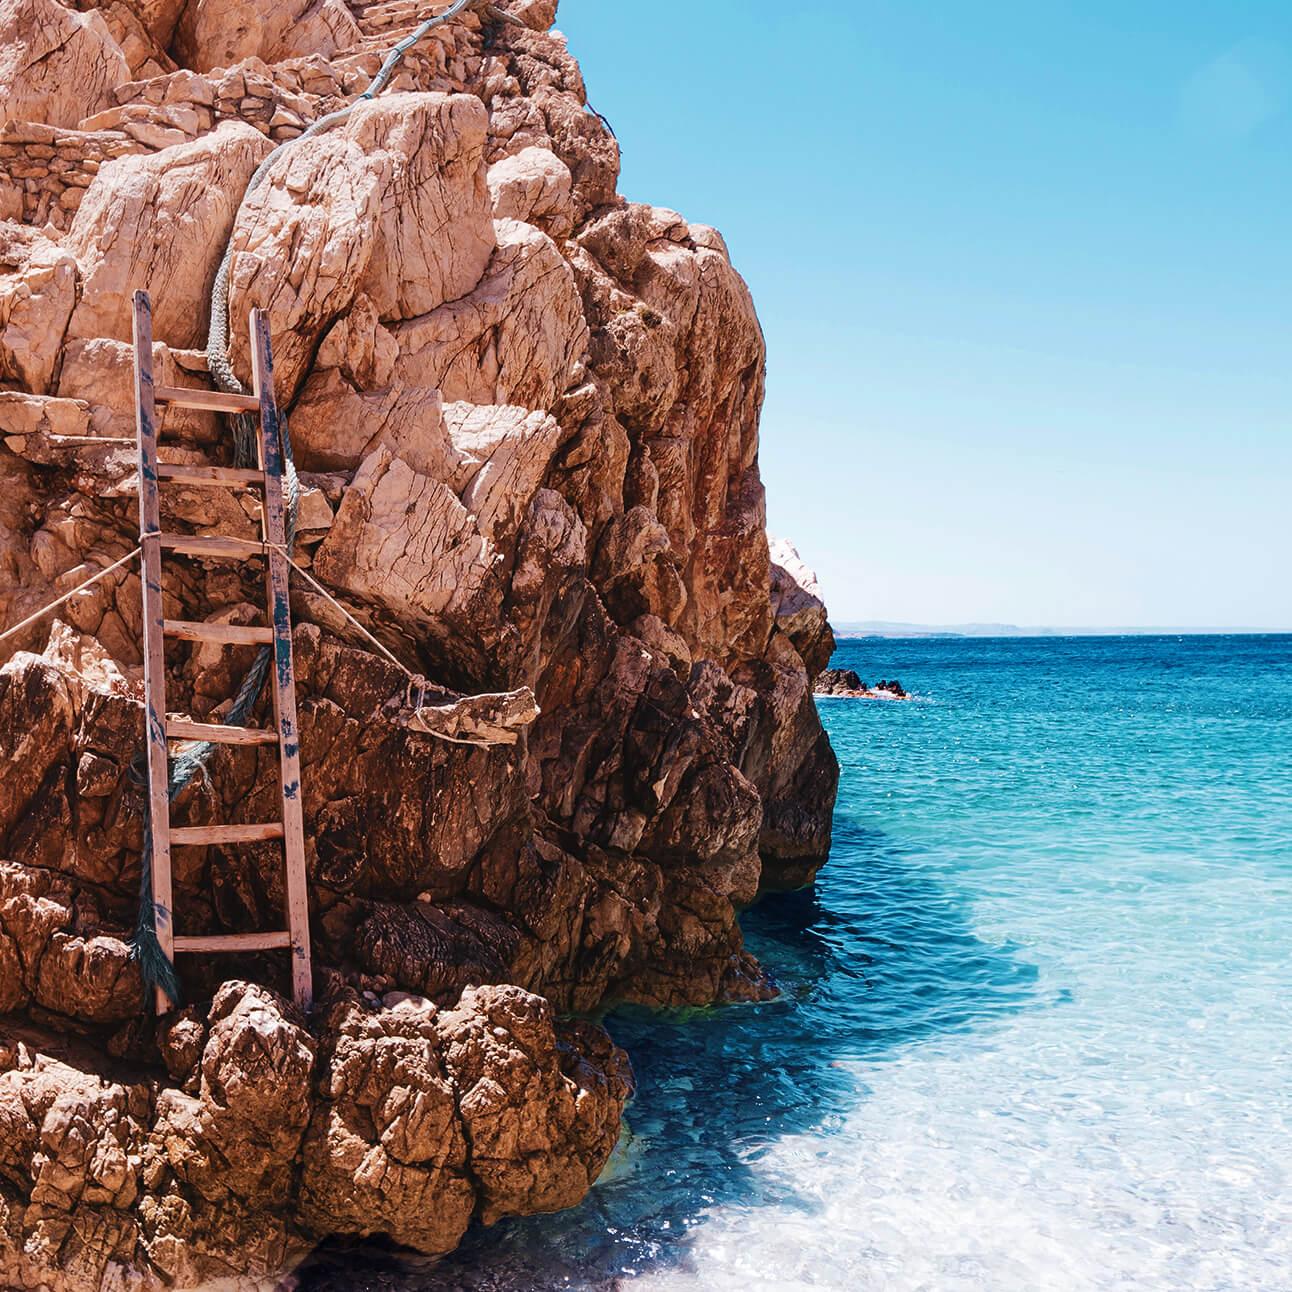 Grecia > Karpathos > Casa Vacanze Karpathos | Viaggi nel ...